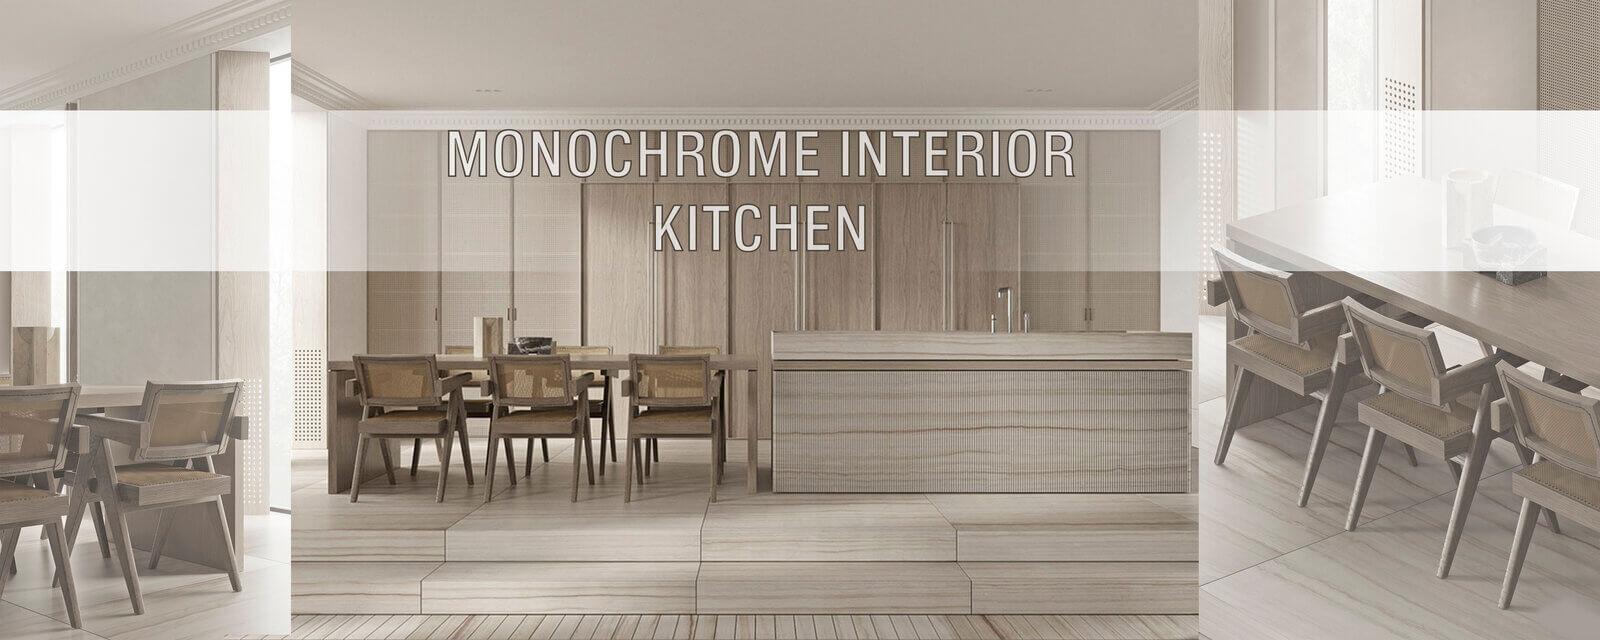 Monochrome Interior | Kitchen